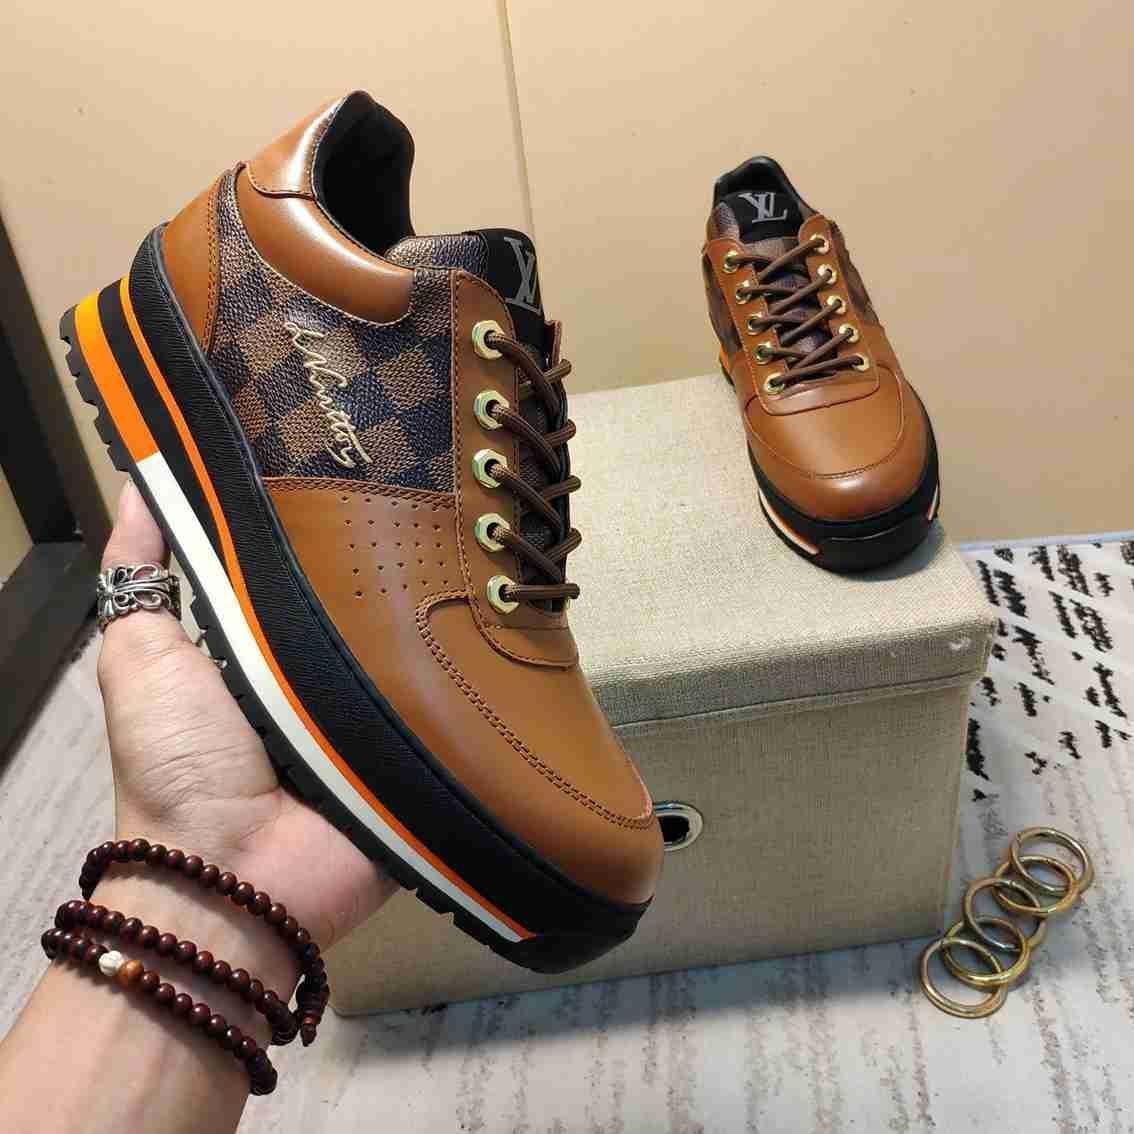 2019Designer Mens sapatos de luxo Trainers SapatilhasLVLouisBusiness Casual sapatos masculinos 38-45 1127-22